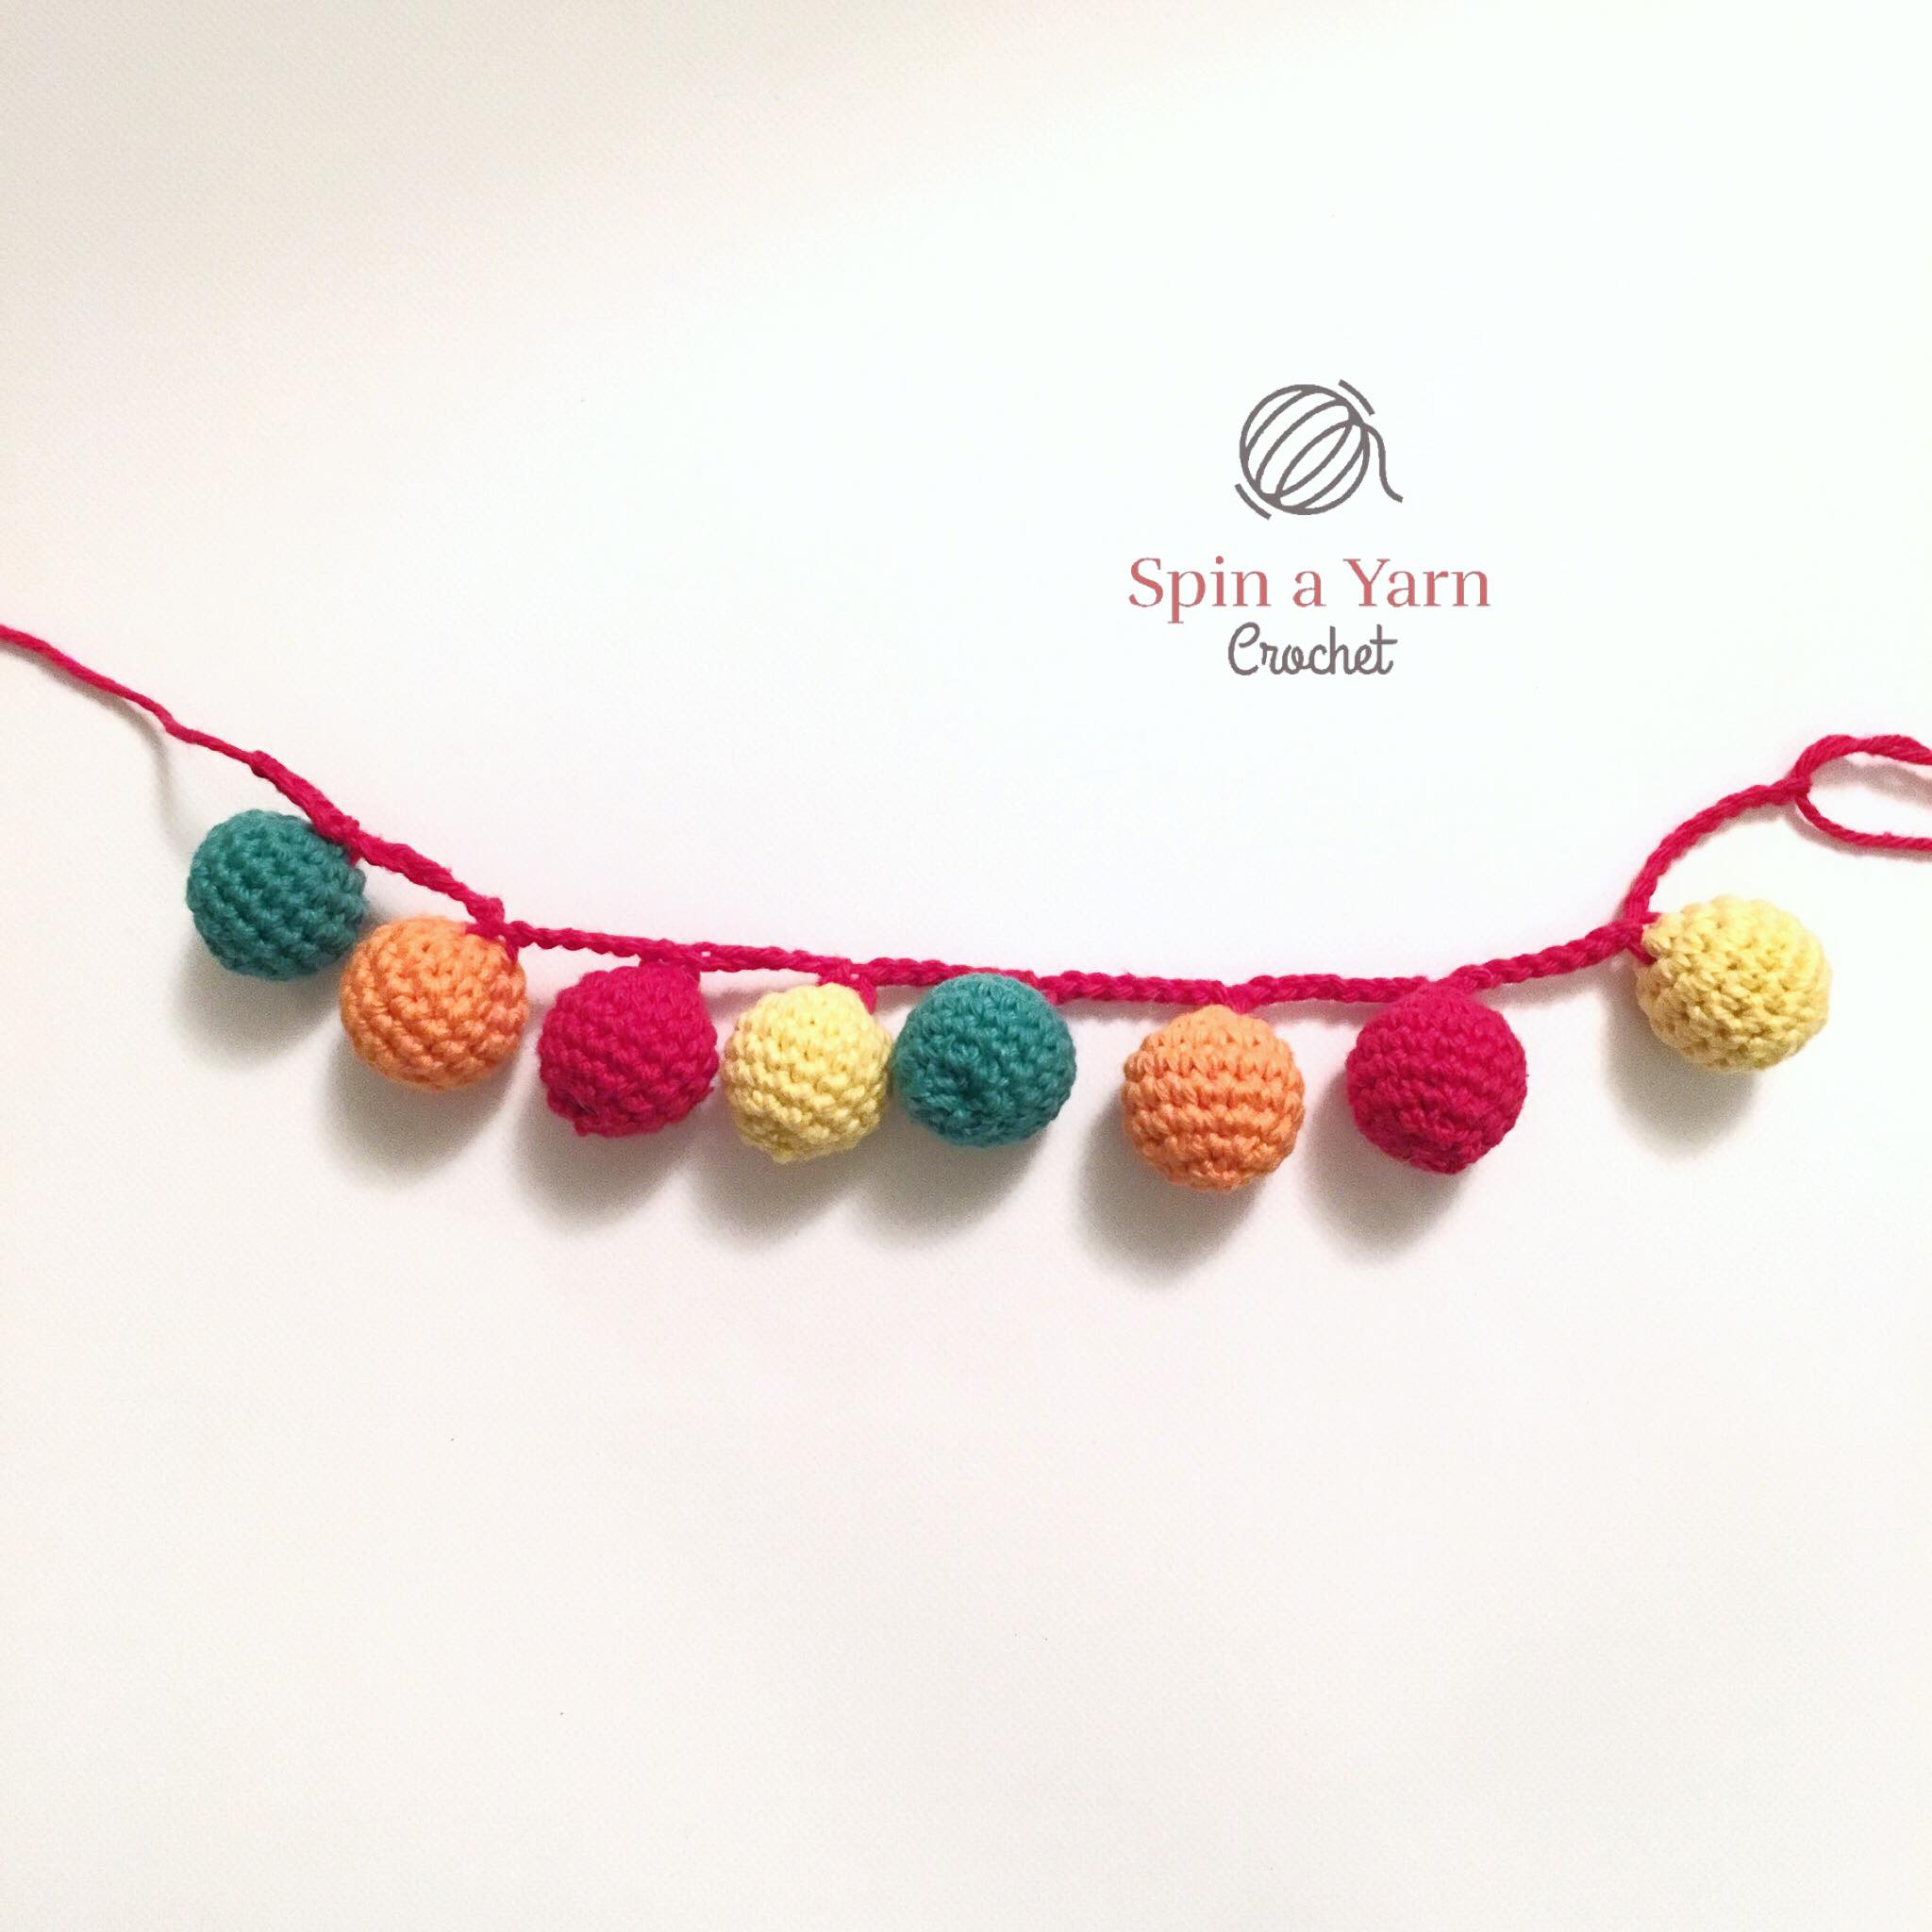 ba79240aa9130 Ragdoll Llama Free Crochet Pattern • Spin a Yarn Crochet